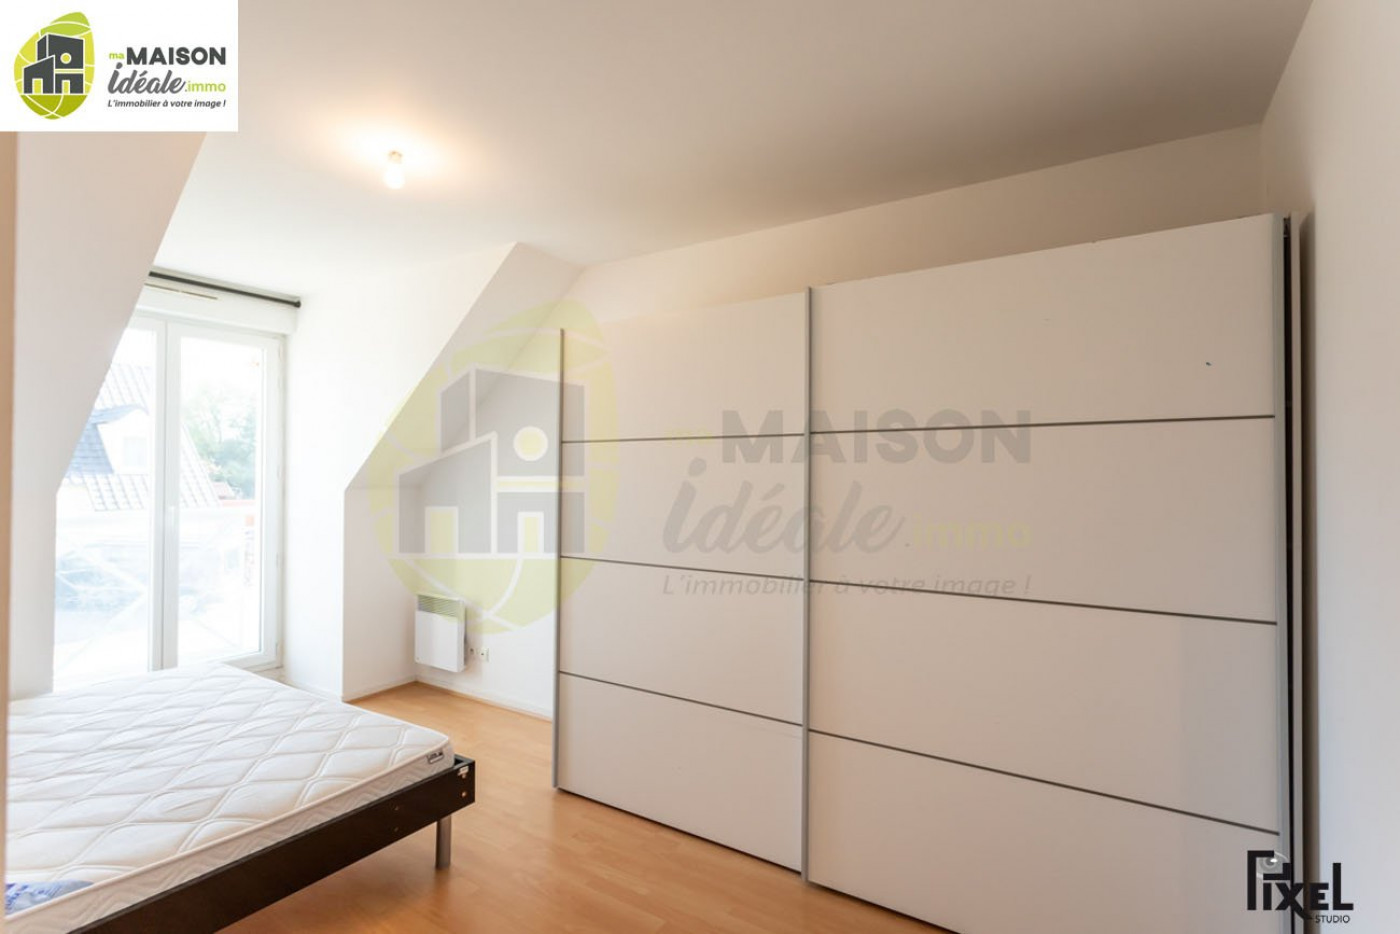 A vendre  Morthomiers | Réf 36003871 - Ma maison ideale